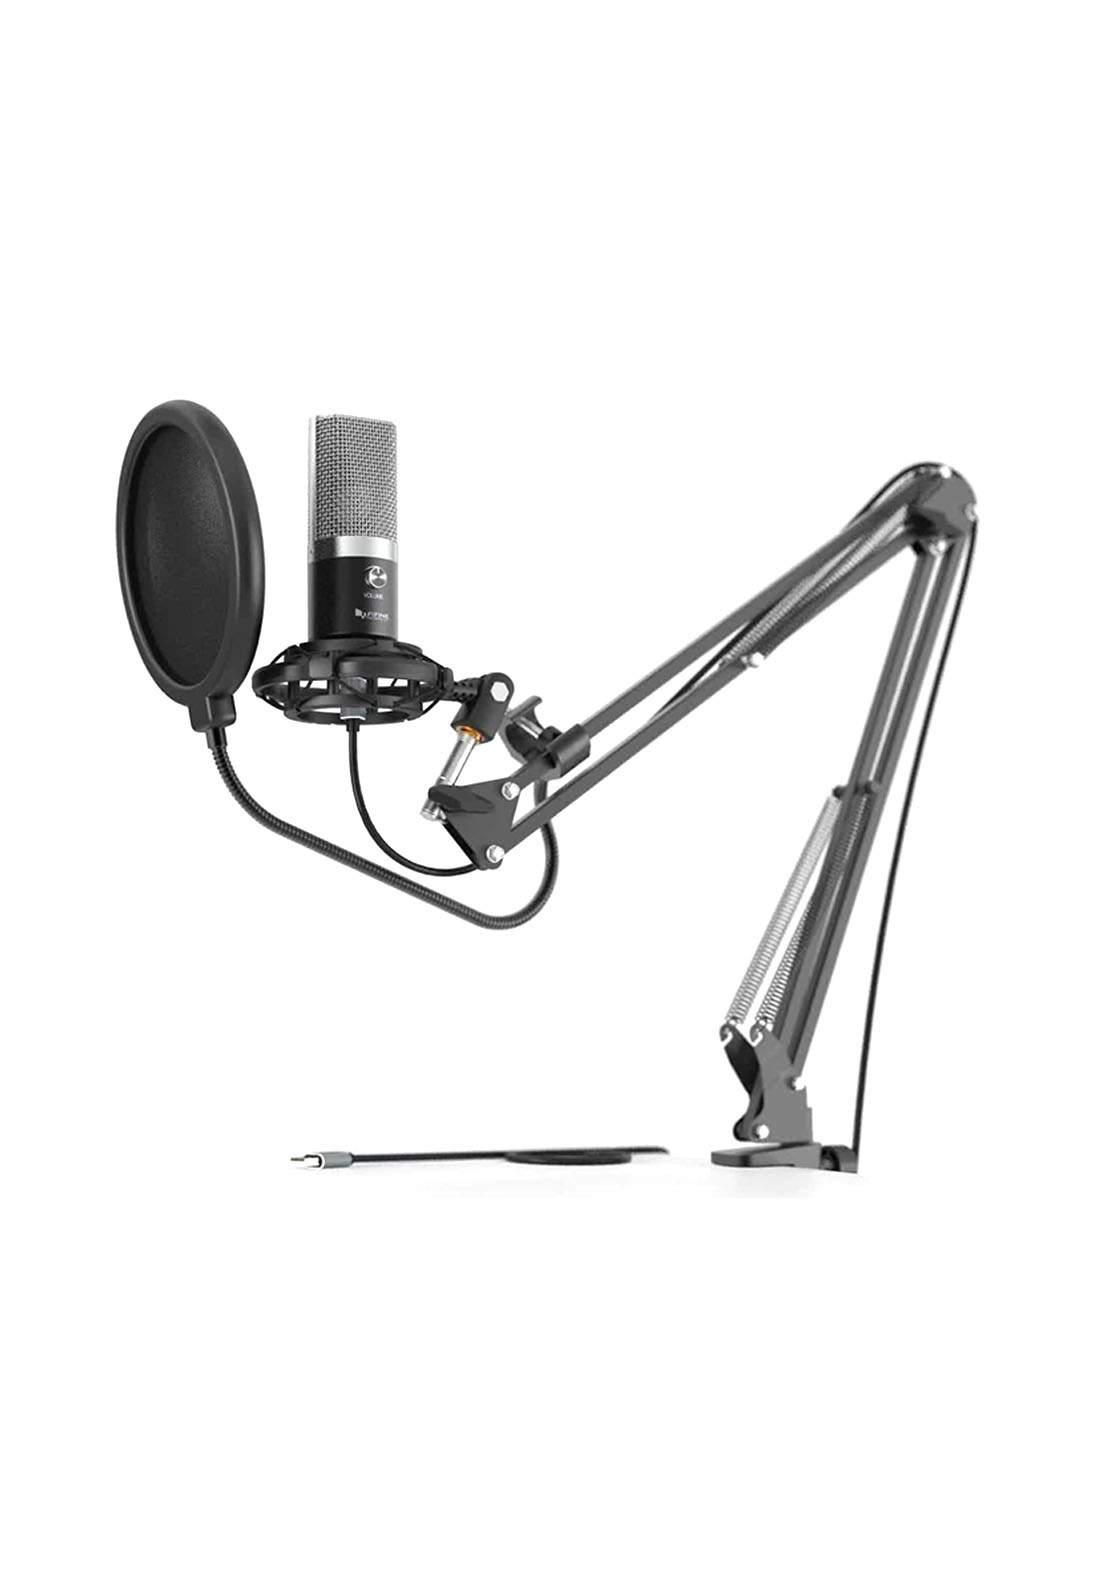 Fifine T670 USB Microphone With Studio Bundle Kit - Black مايكروفون